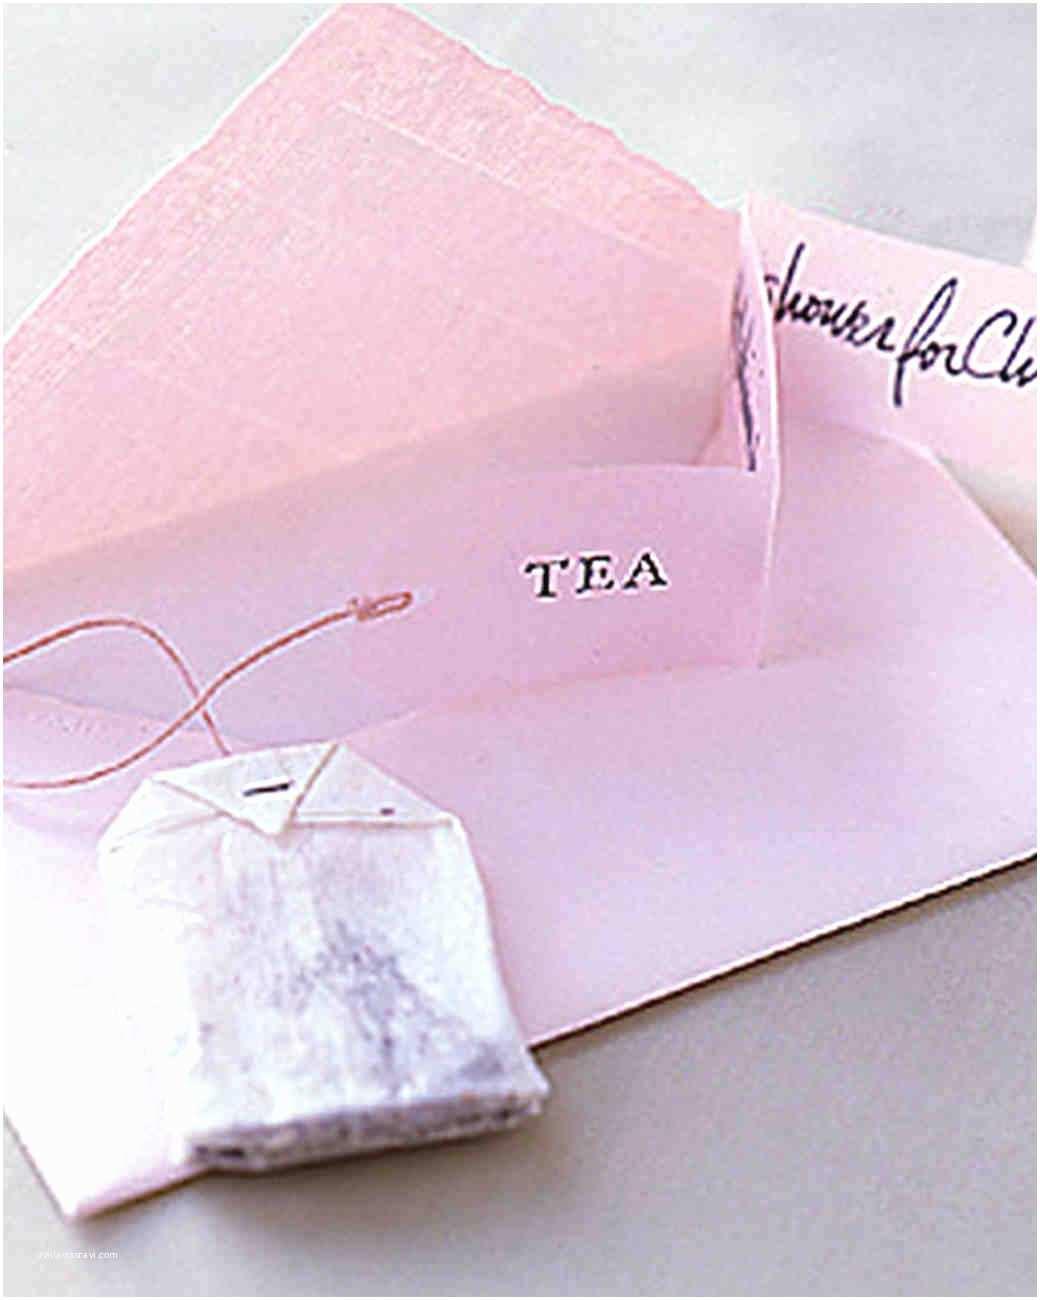 Wedding Tea Invitations Bridal Shower Tea Party Ideas for A Sip Worthy Celebration